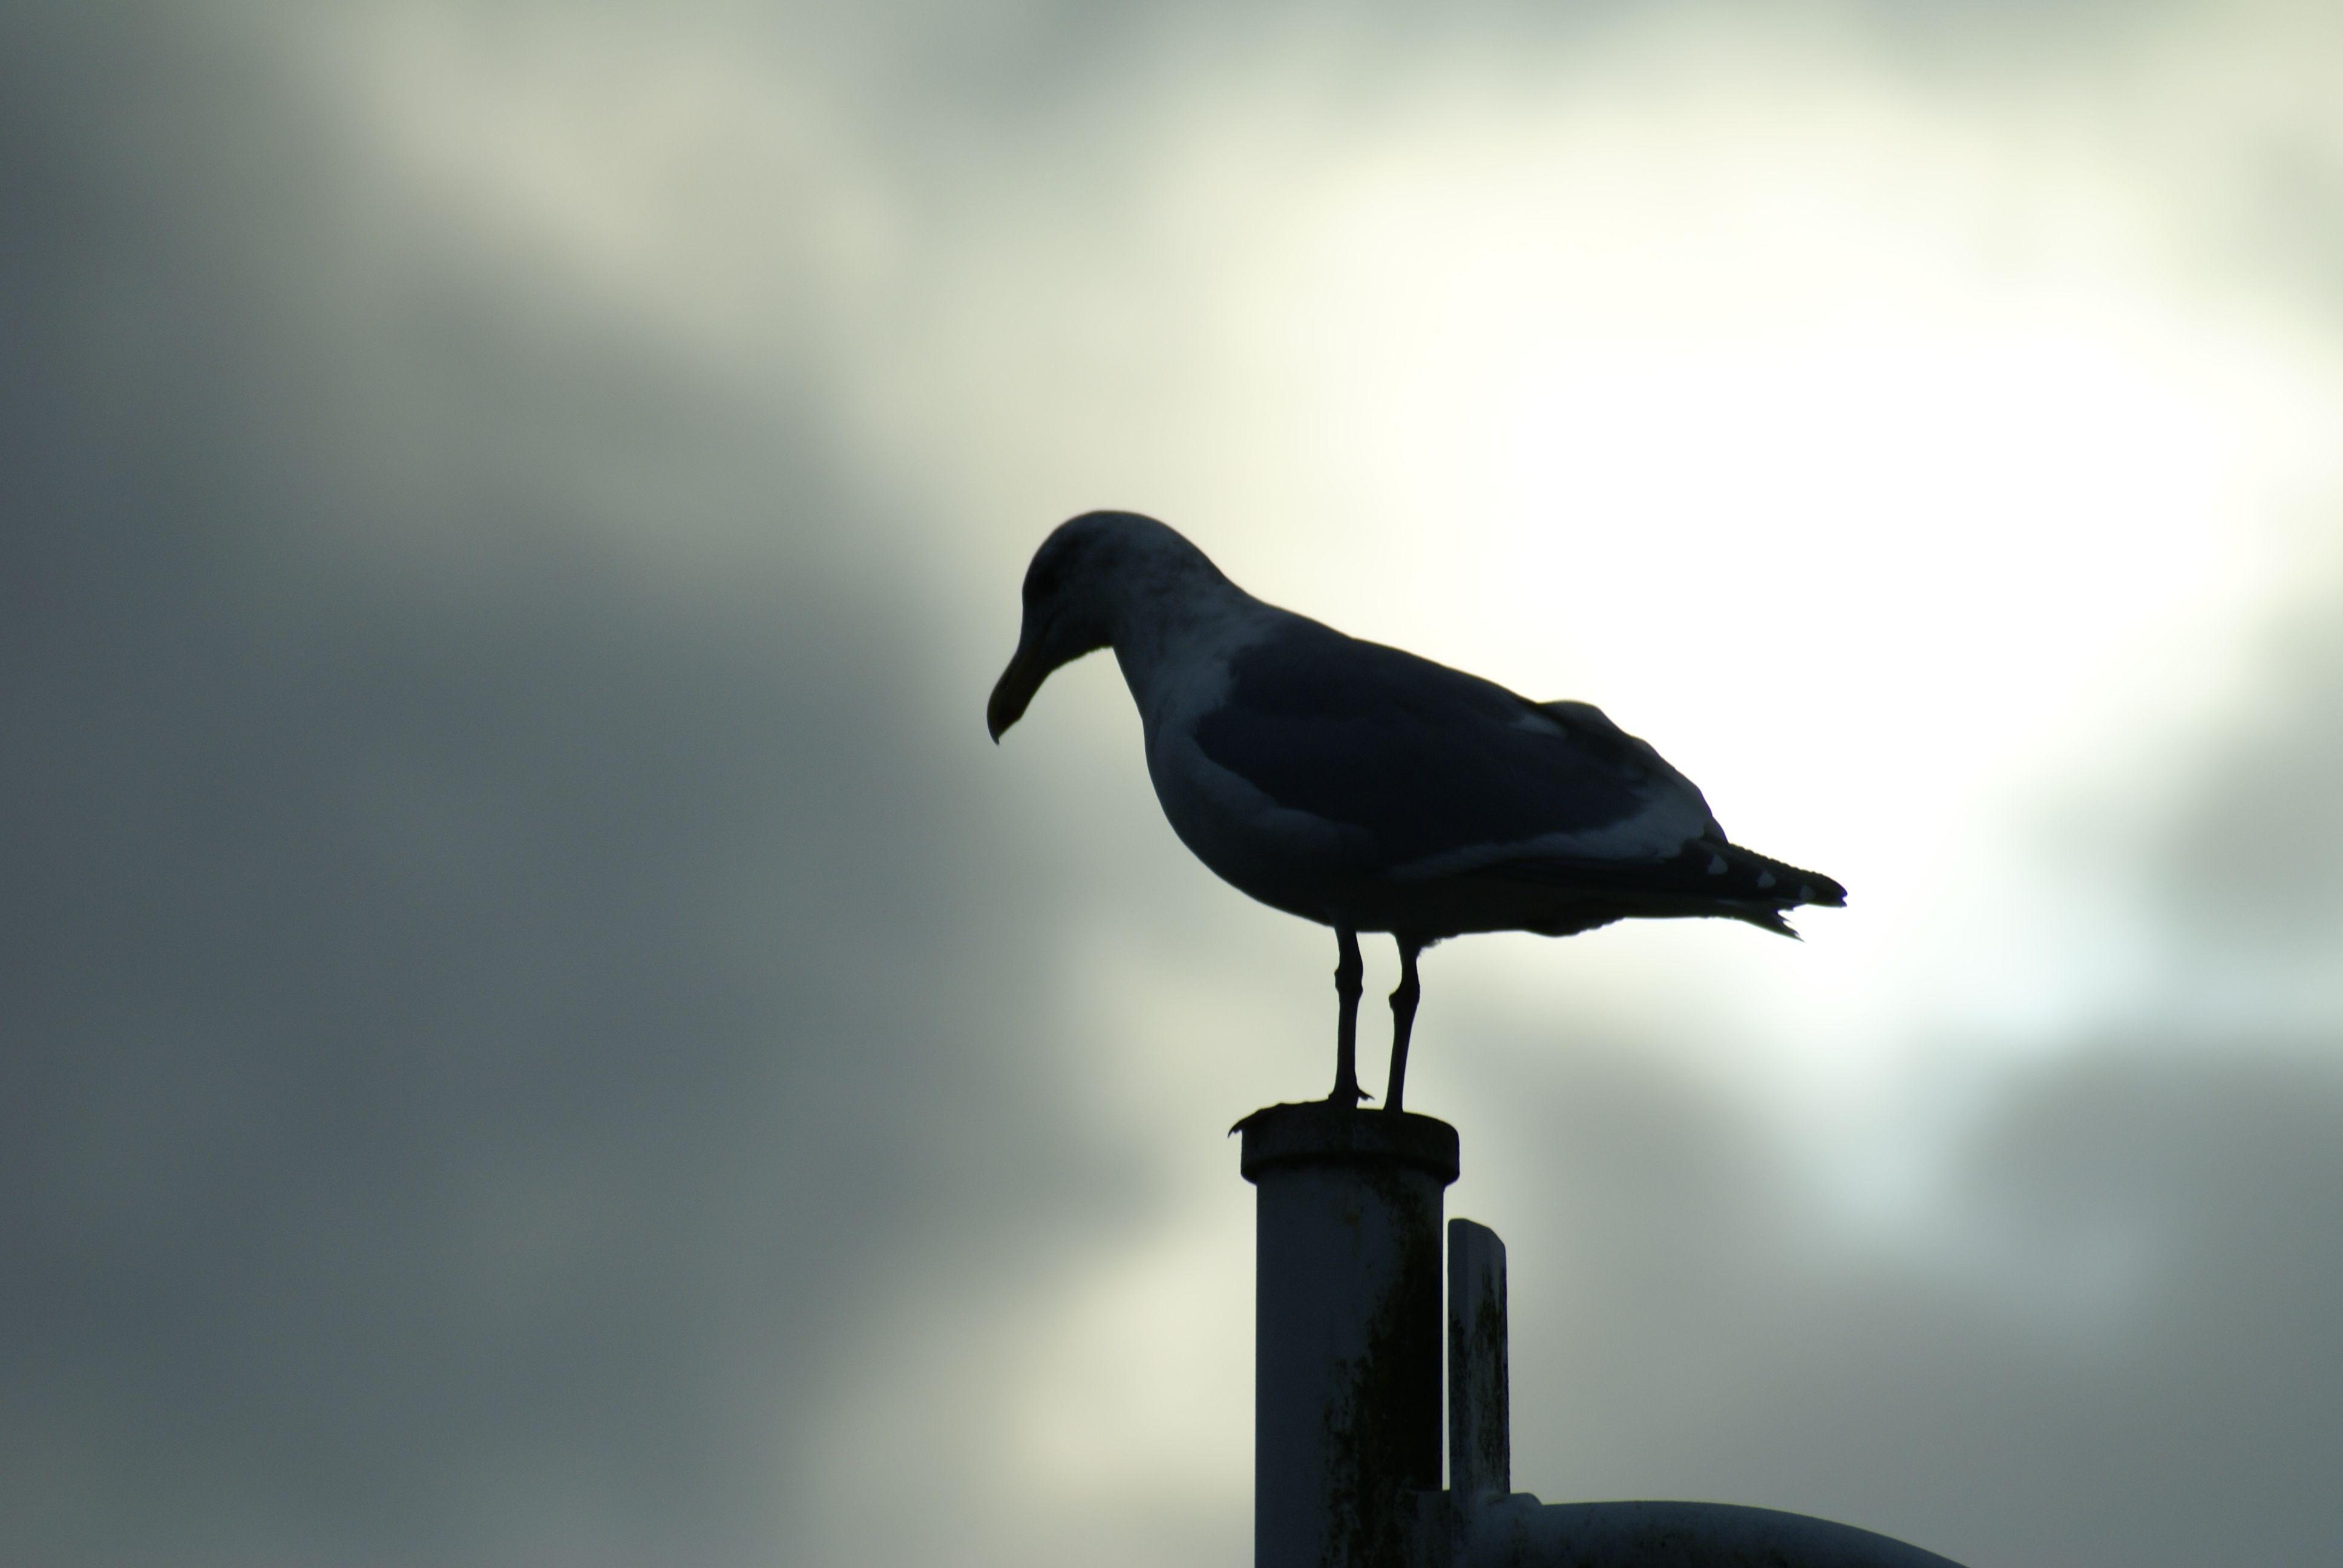 seagull silhouette | Animal Photos | Pinterest